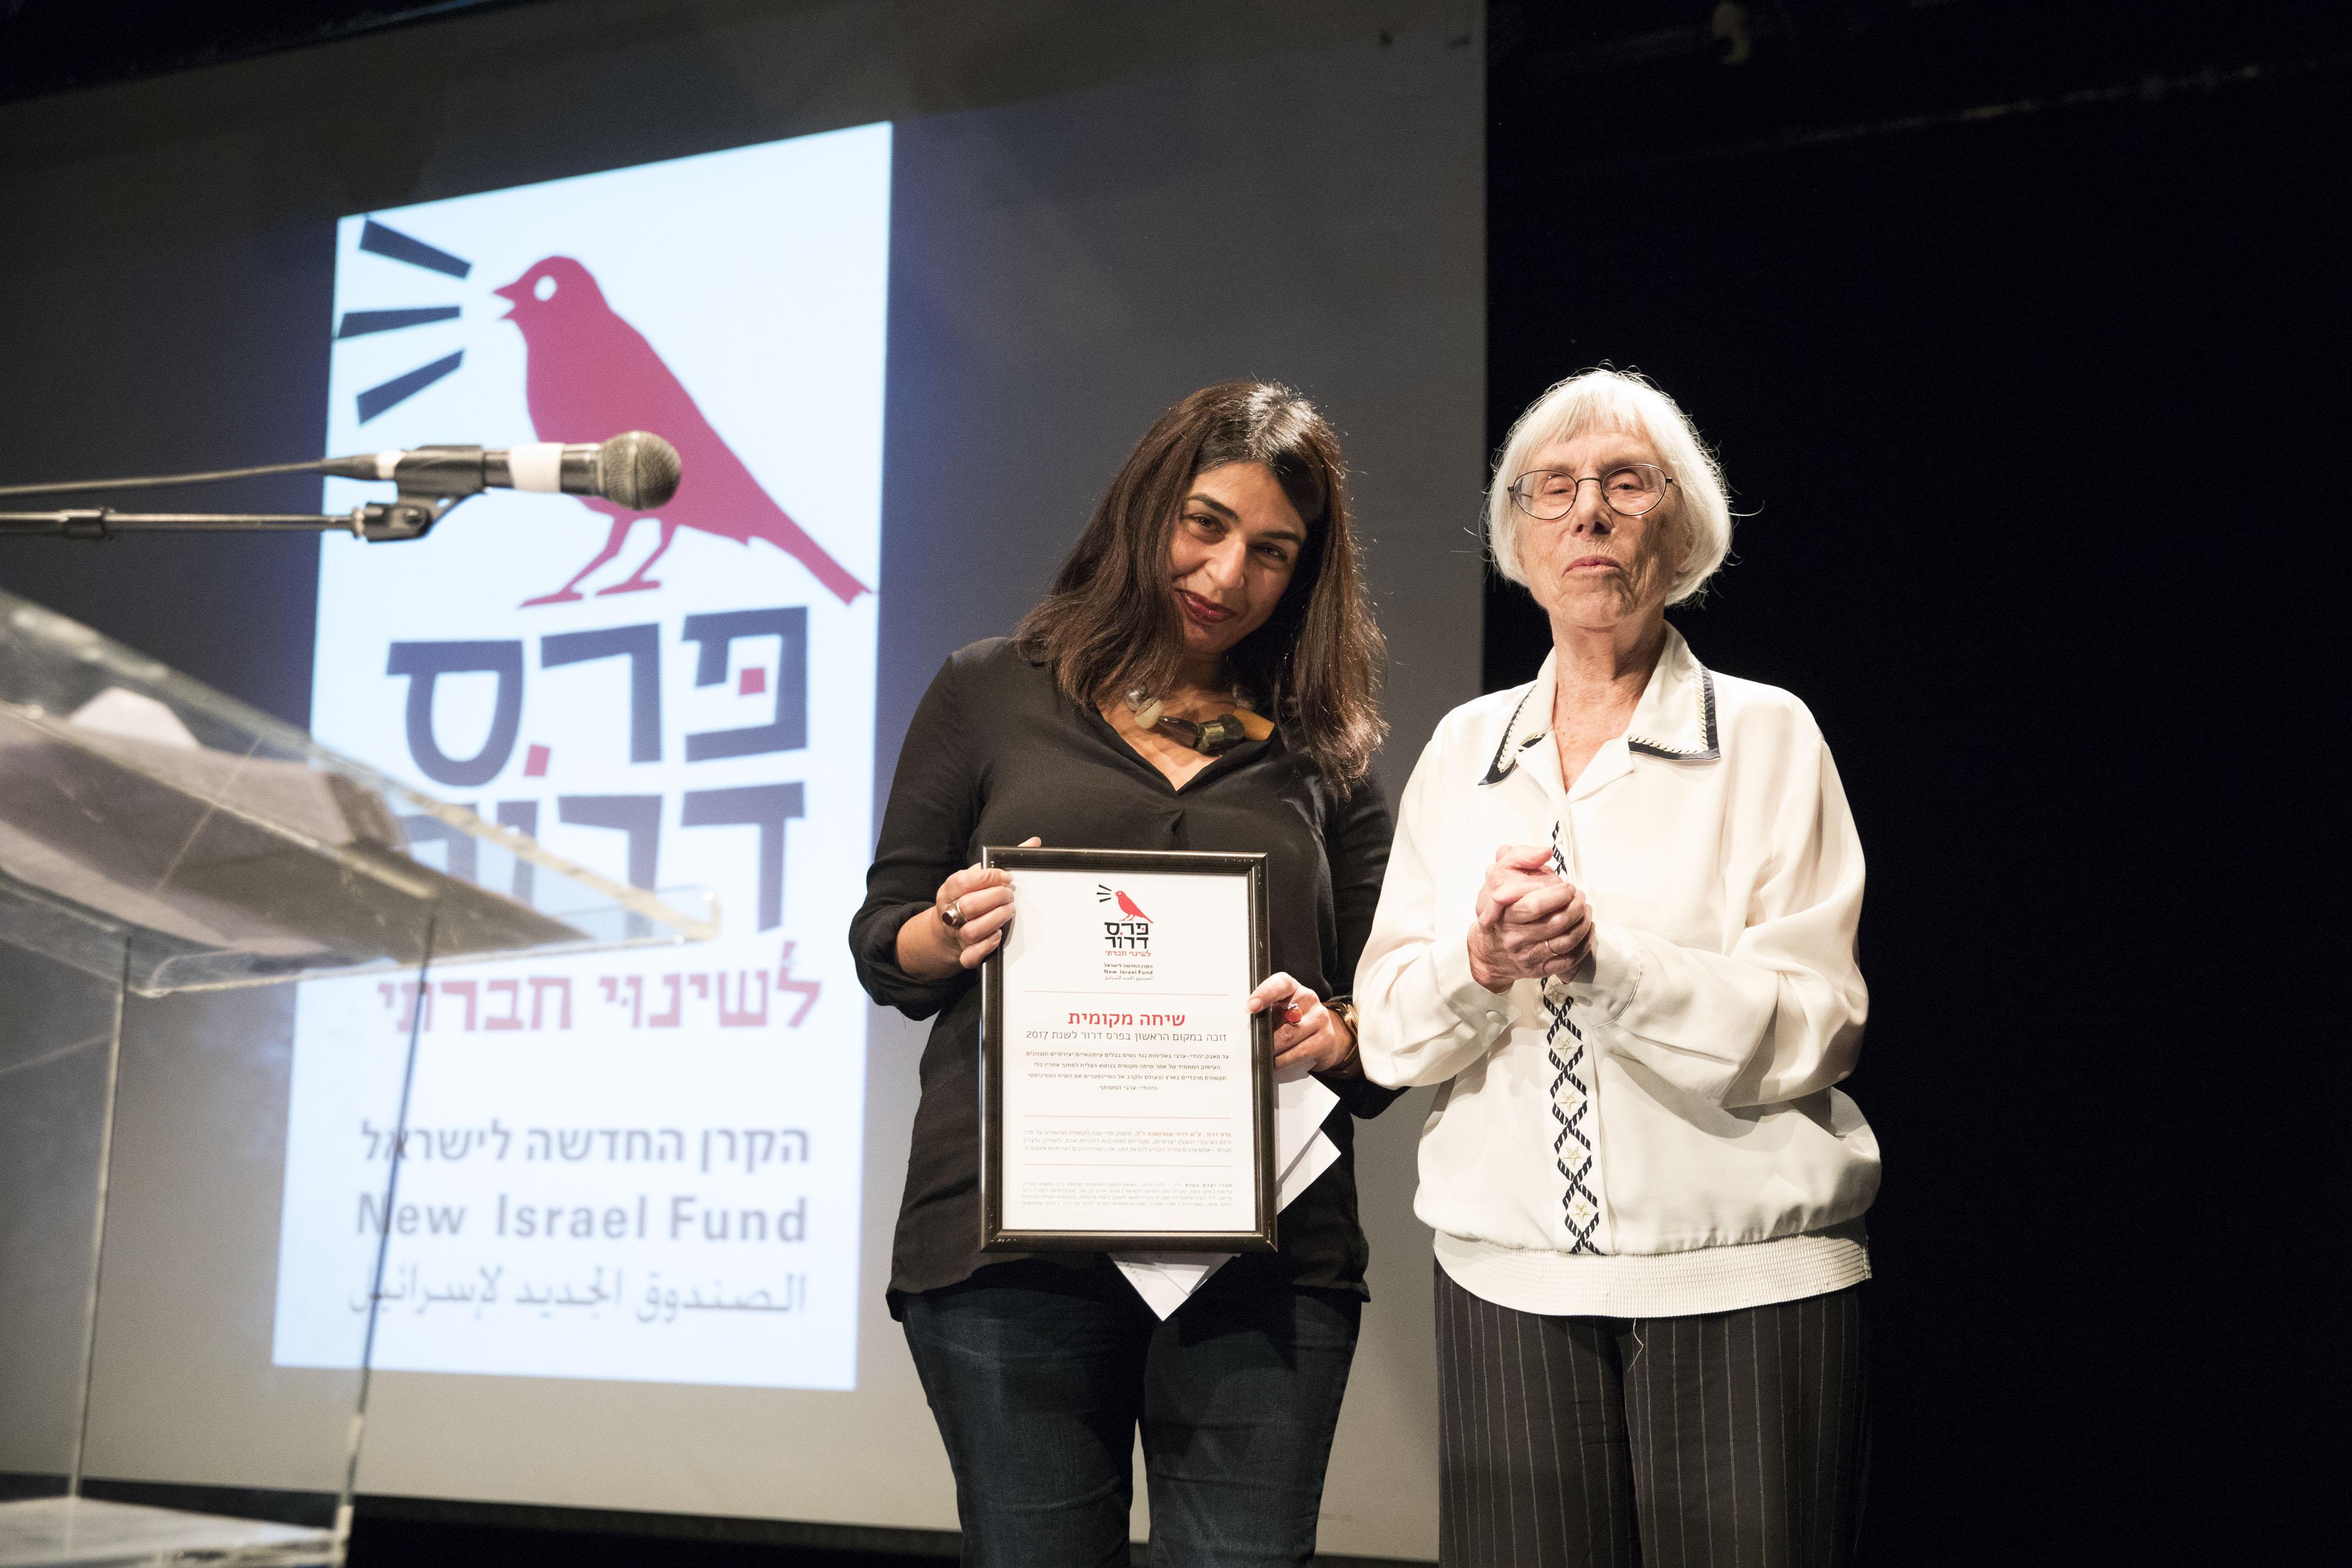 Local Call editor Orly Noy accepts the Dror Prize from former Supreme Court Justice Dalia Dorner, Tel Aviv, December 1, 2017. (Oren Ziv/Activestills.org)